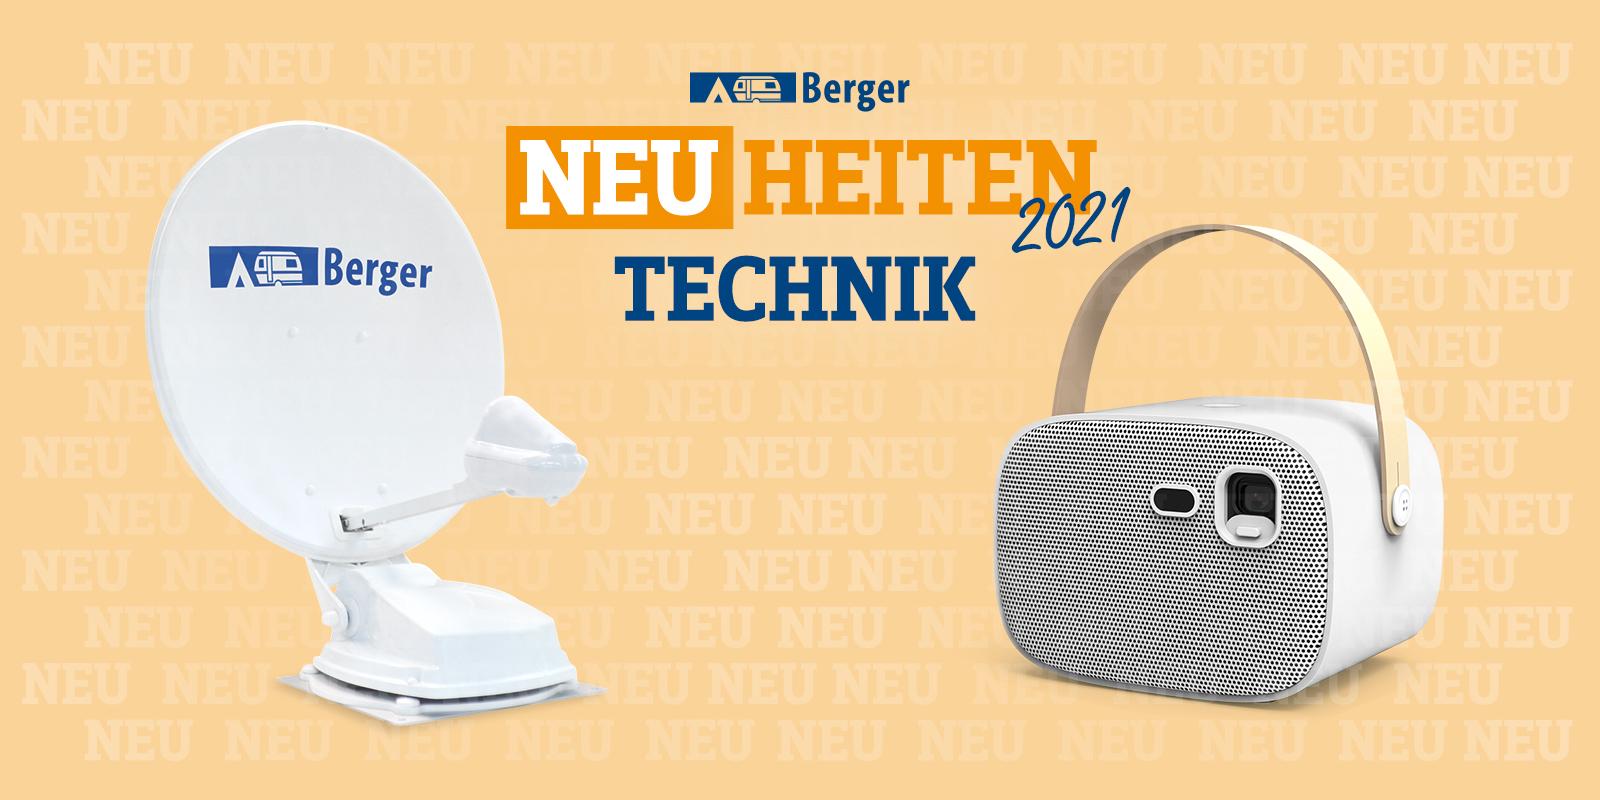 <span>Berger Neuheiten 2021: Technik</span>